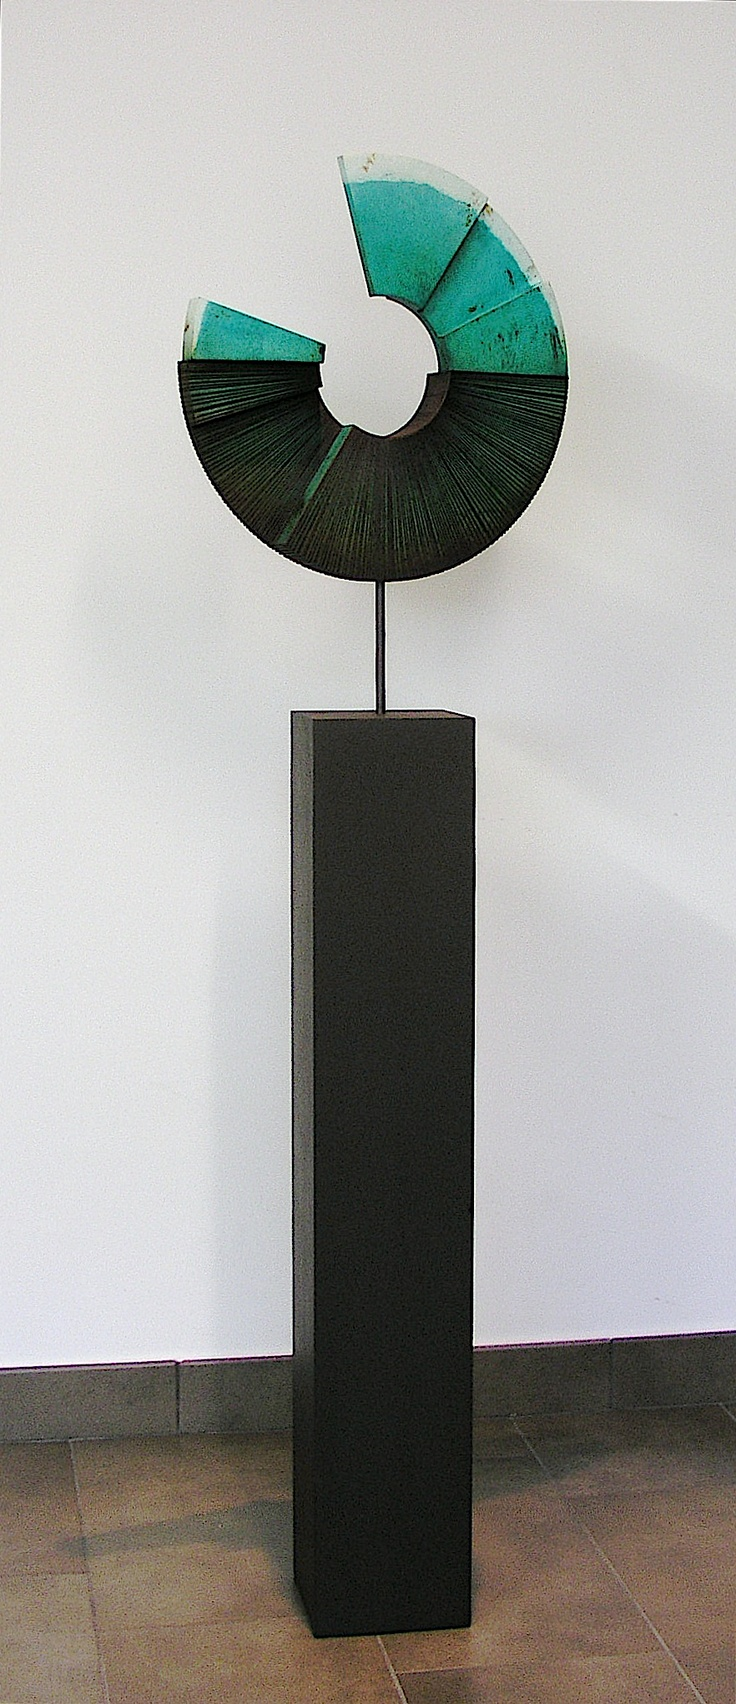 "RAMÓN URBÁN, E42 ""Recolector de sueños XXXVII"" Técnica mixta madera/hierro 157x45 cm.   (Colección particular/Miami)."